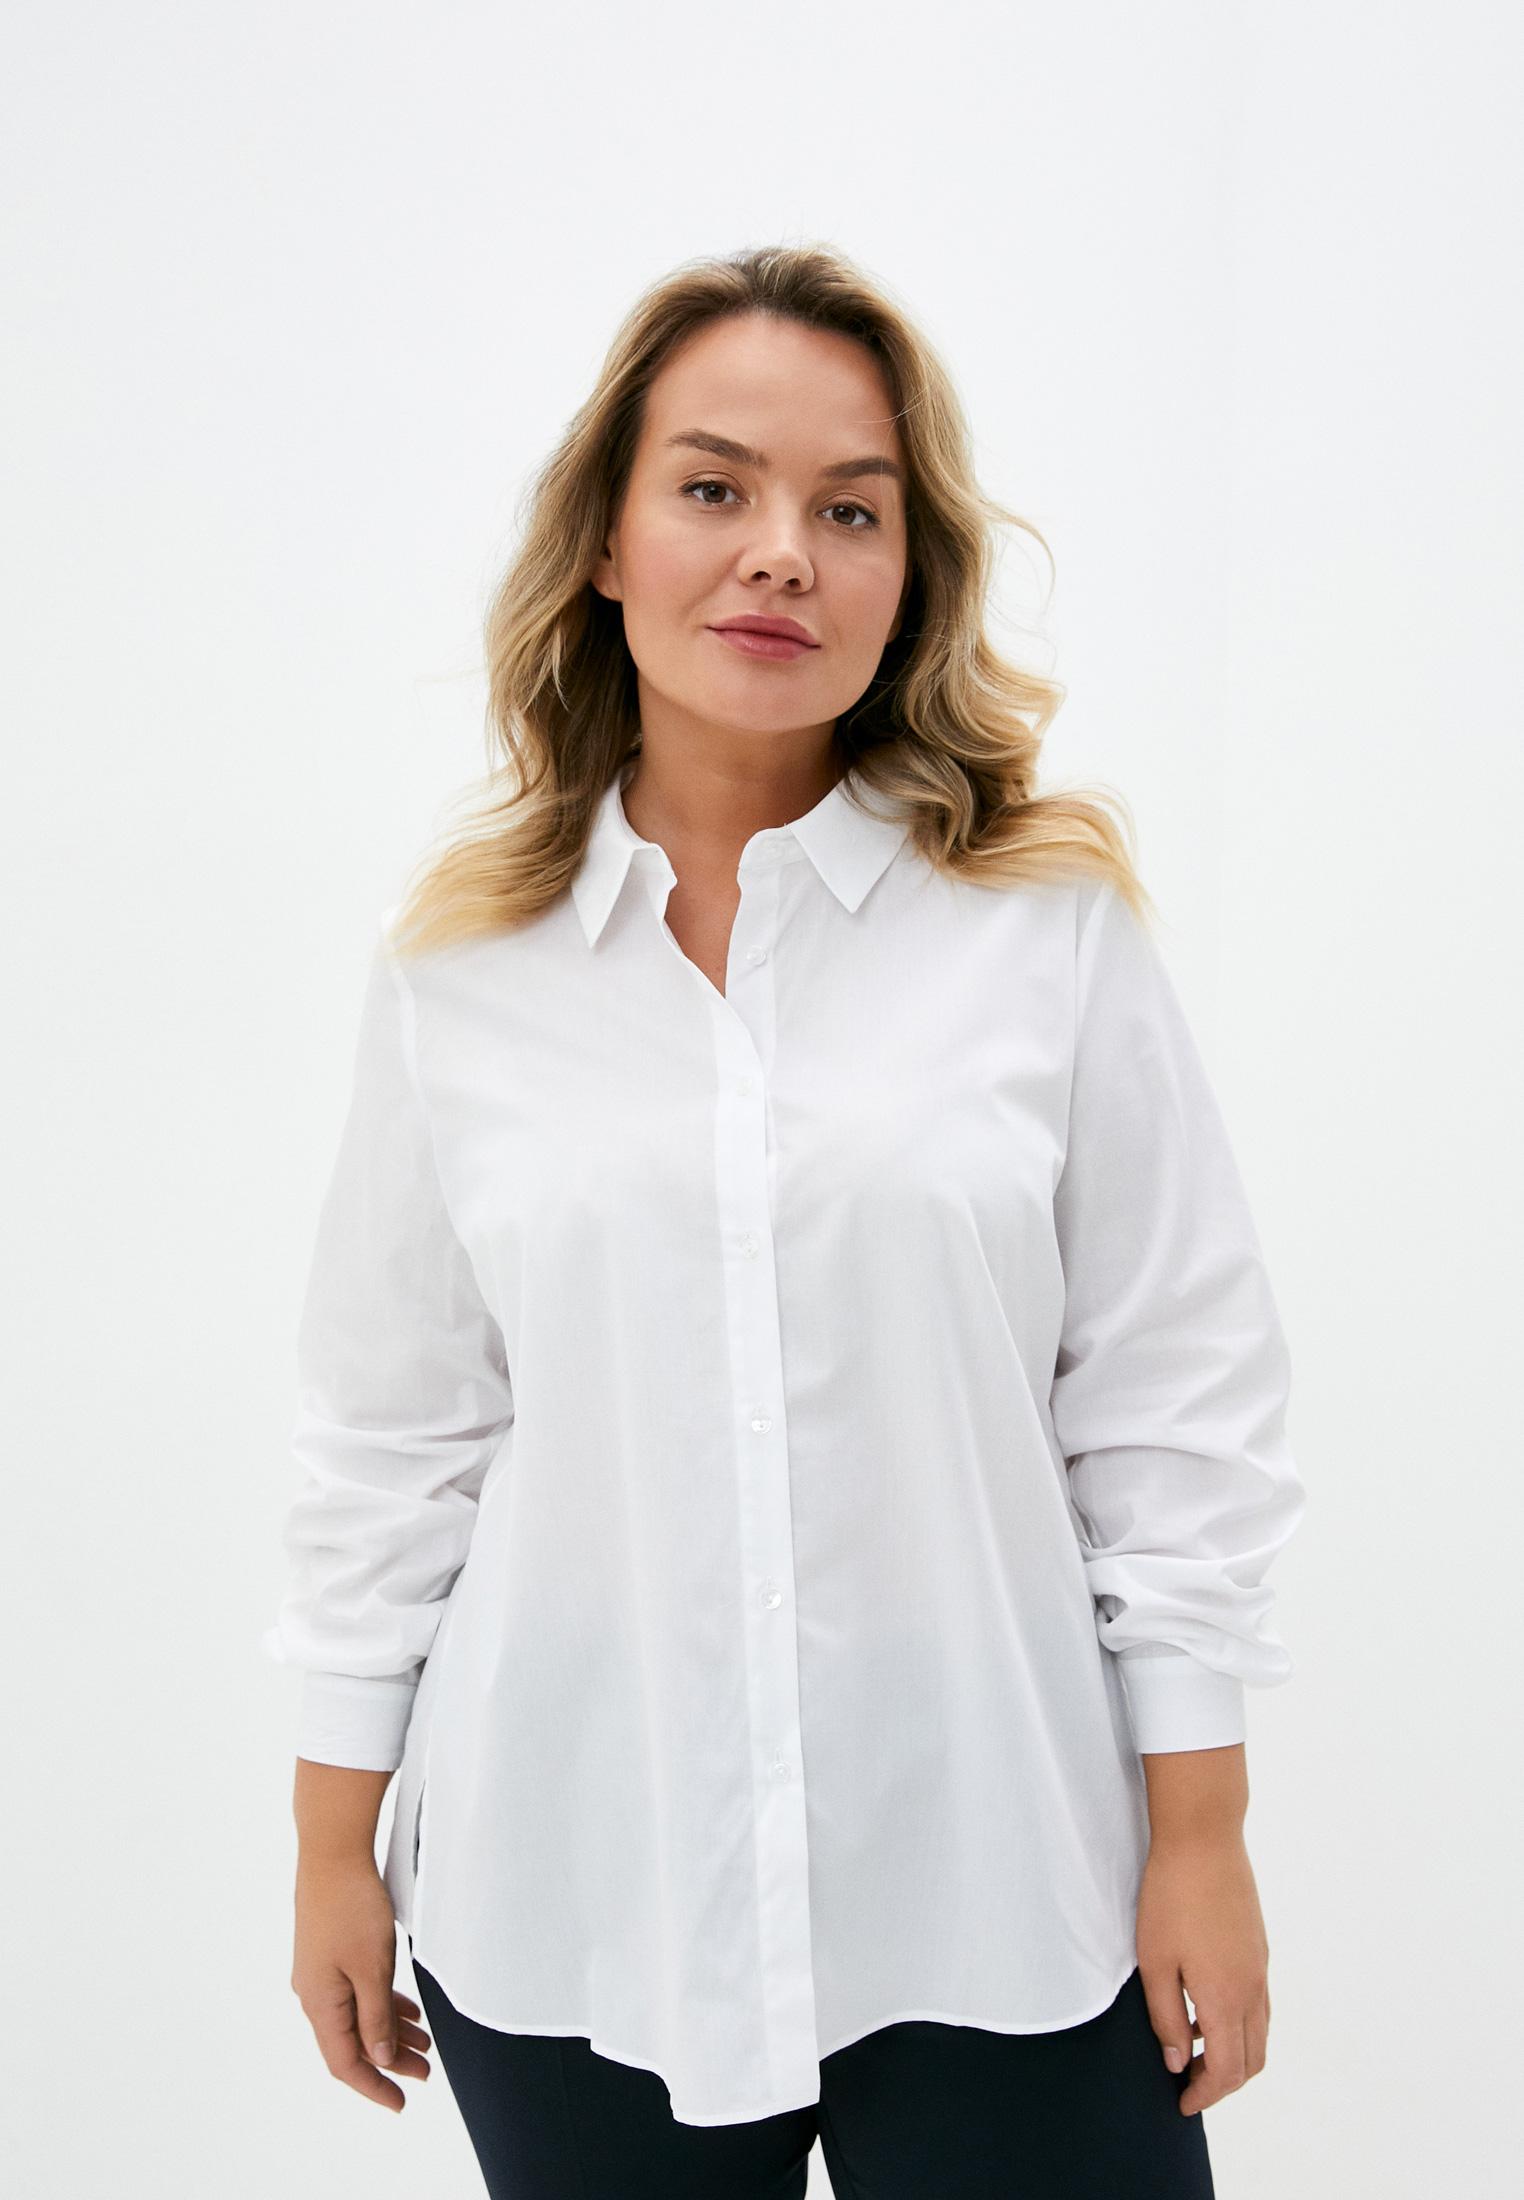 Женские рубашки с длинным рукавом Persona by Marina Rinaldi 1113110